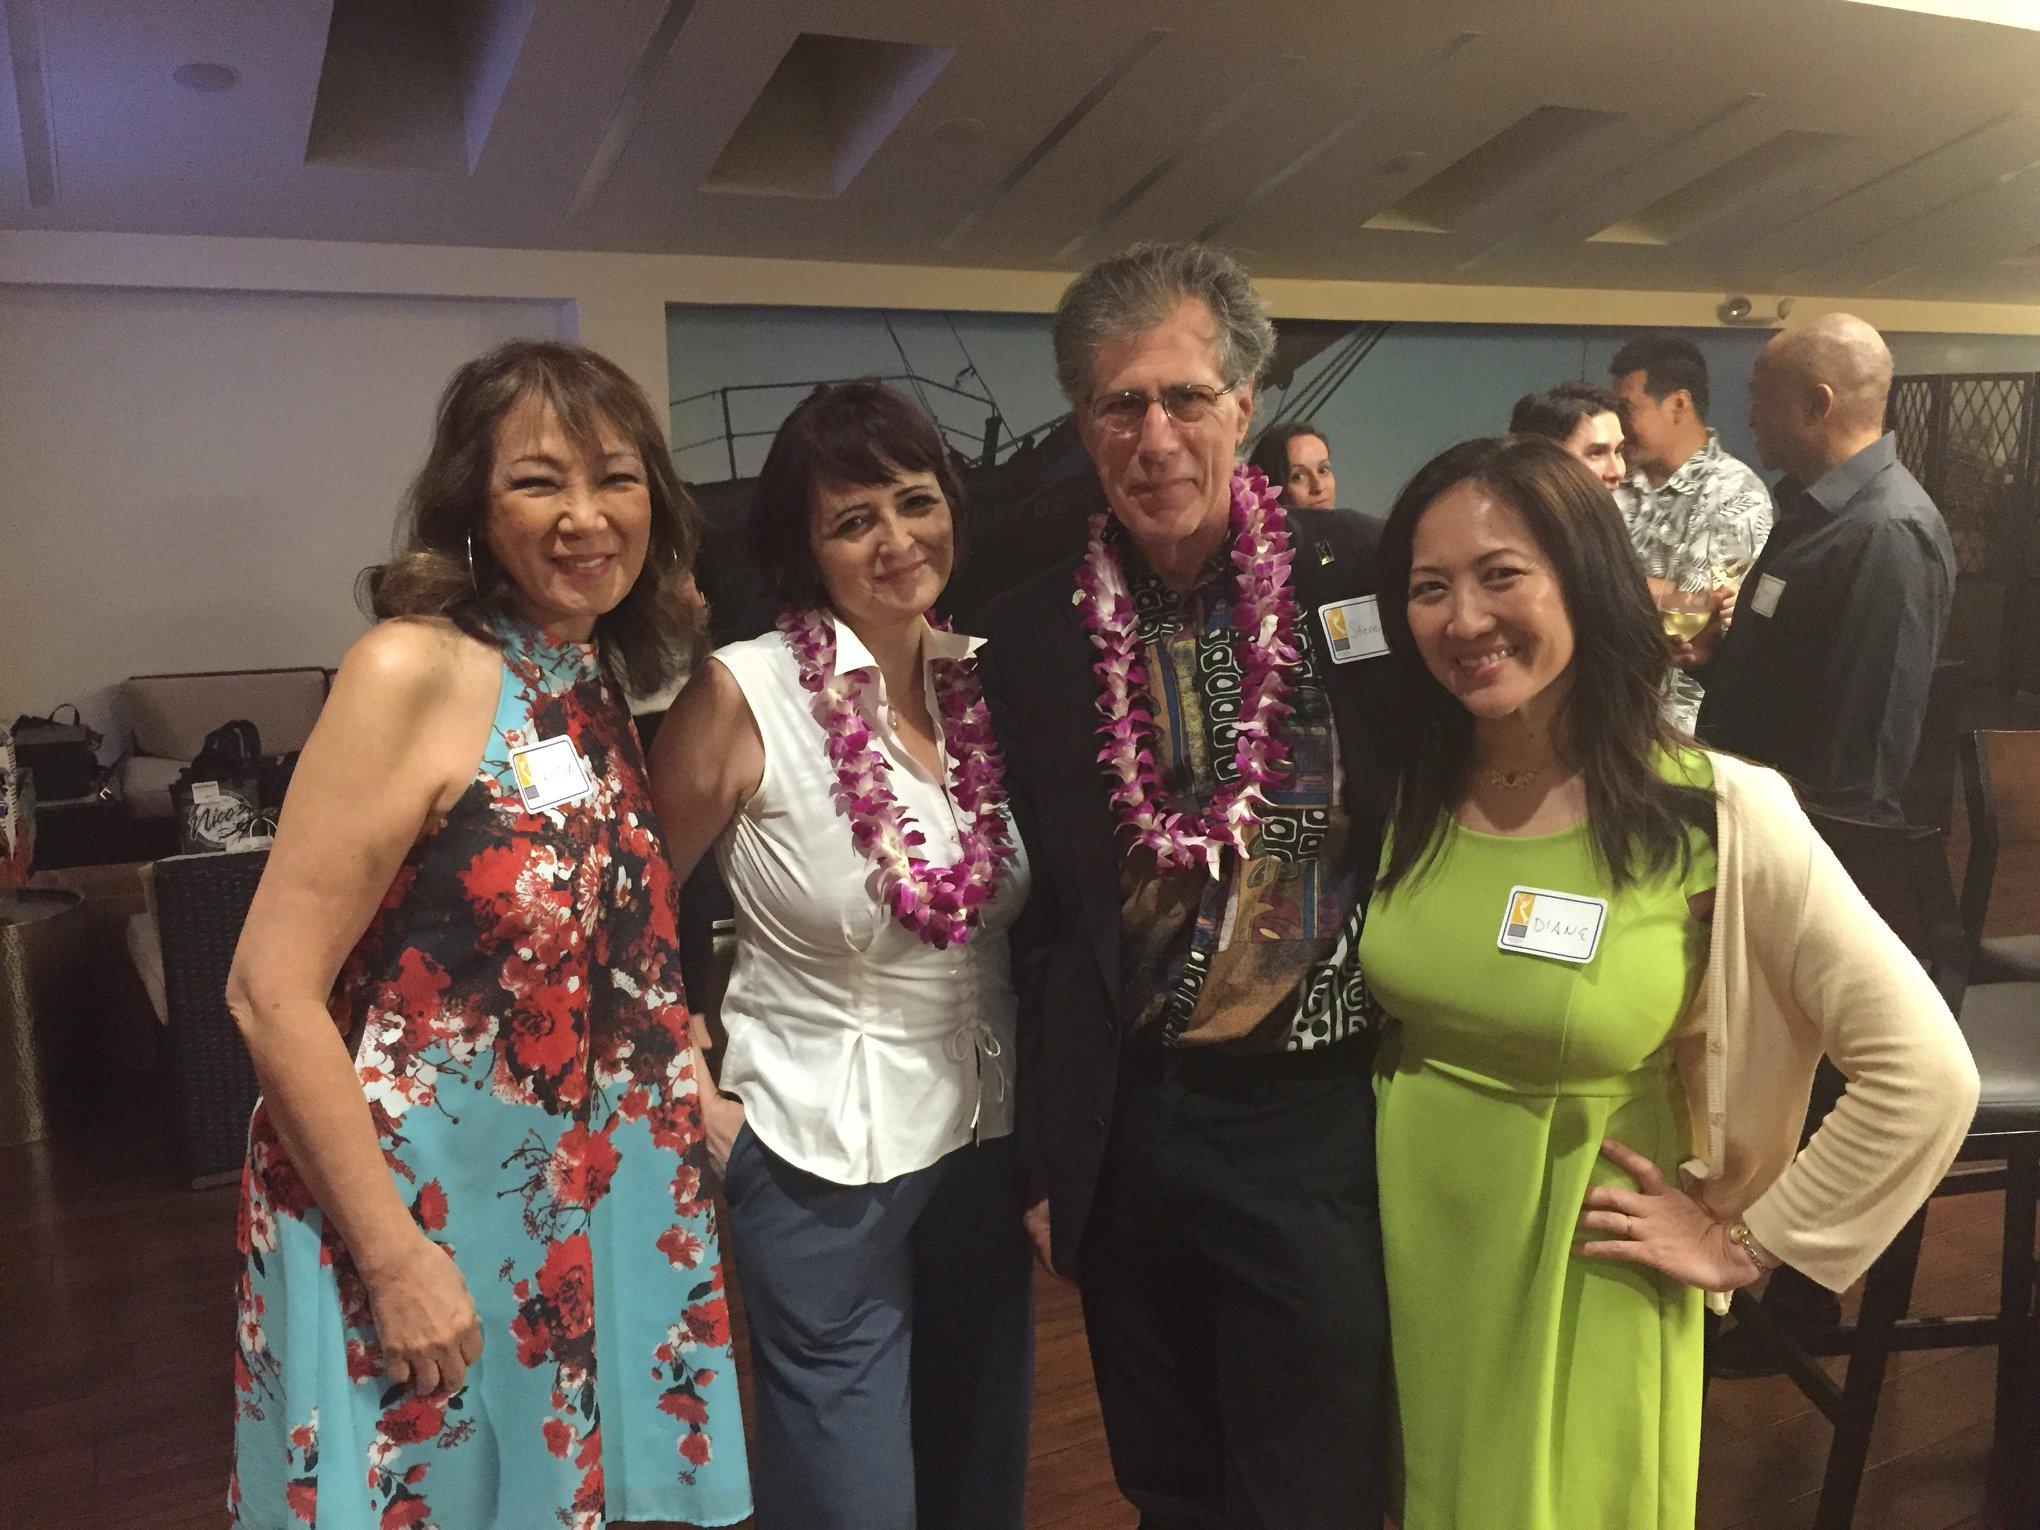 Pamela Young, Patty Zubov, Steve Shlisky, Diane Ako at Hawaii Member Mixer